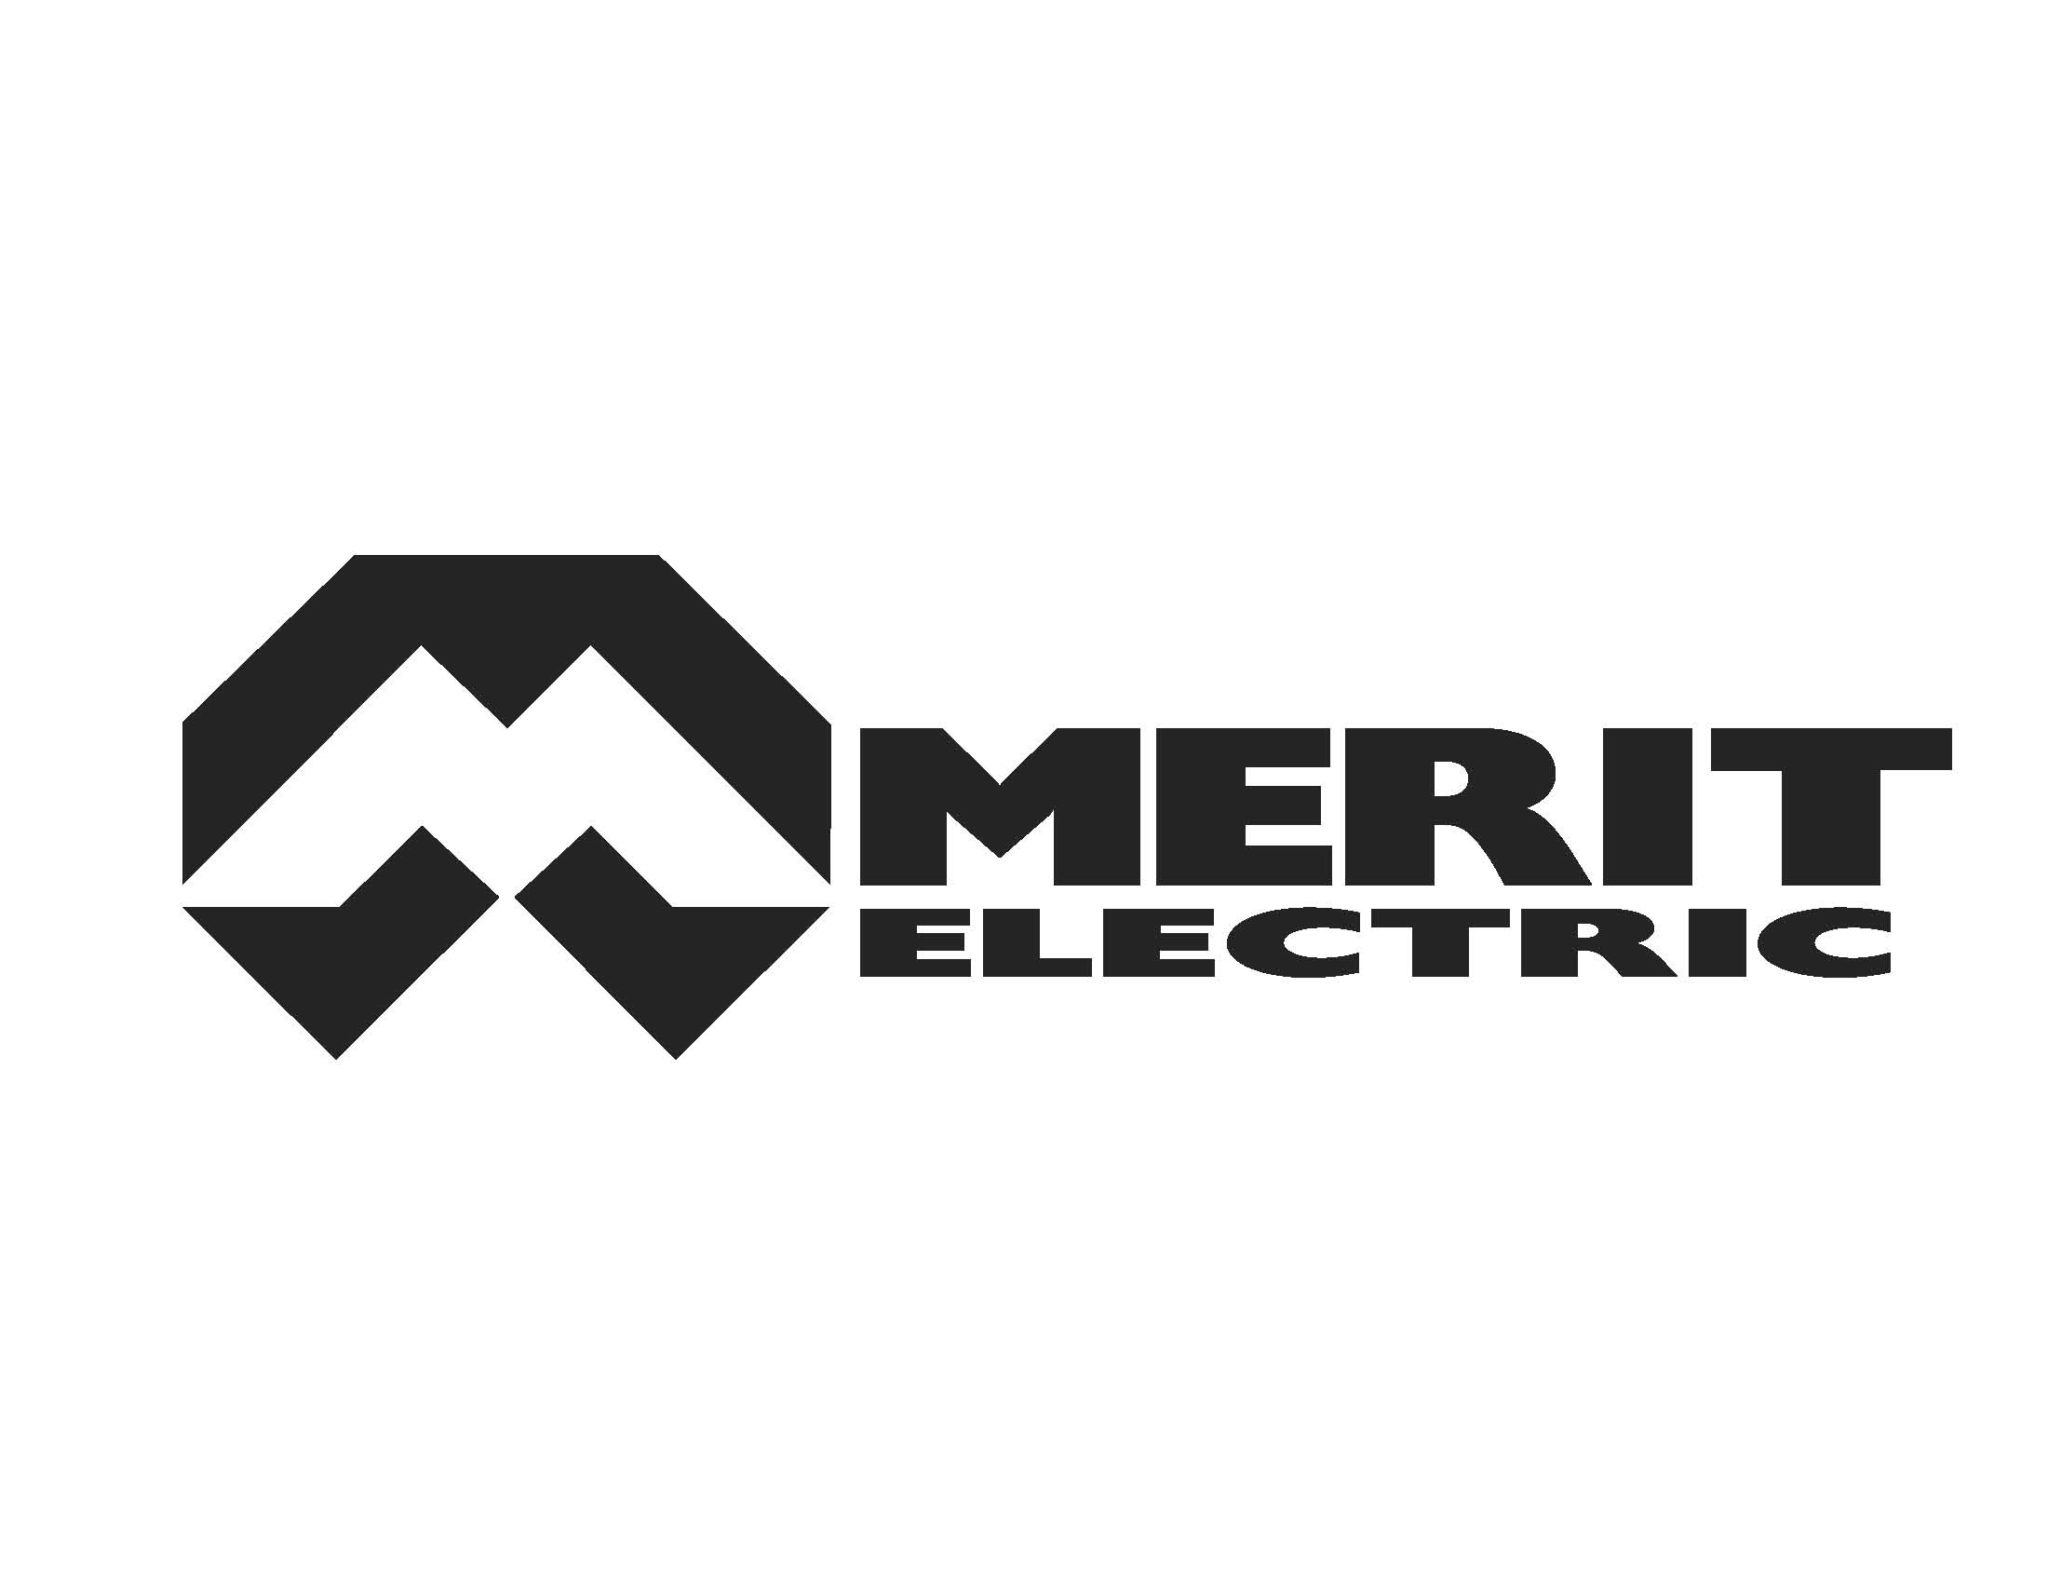 MERIT ELECTRIC LOGO - FINAL